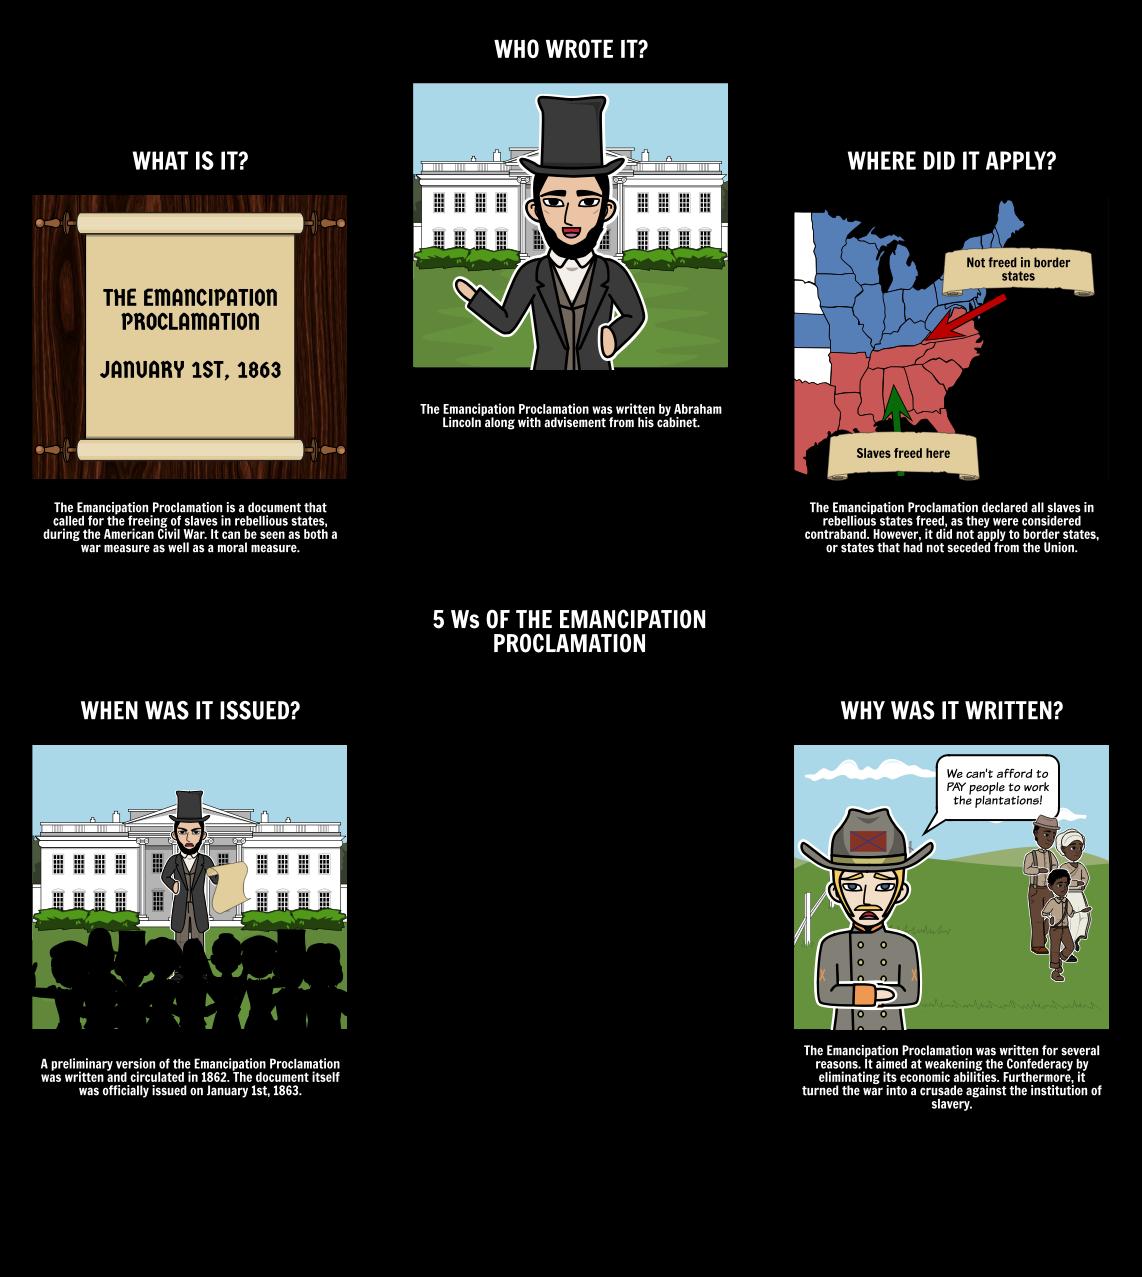 The Emancipation Proclamation 5 Ws